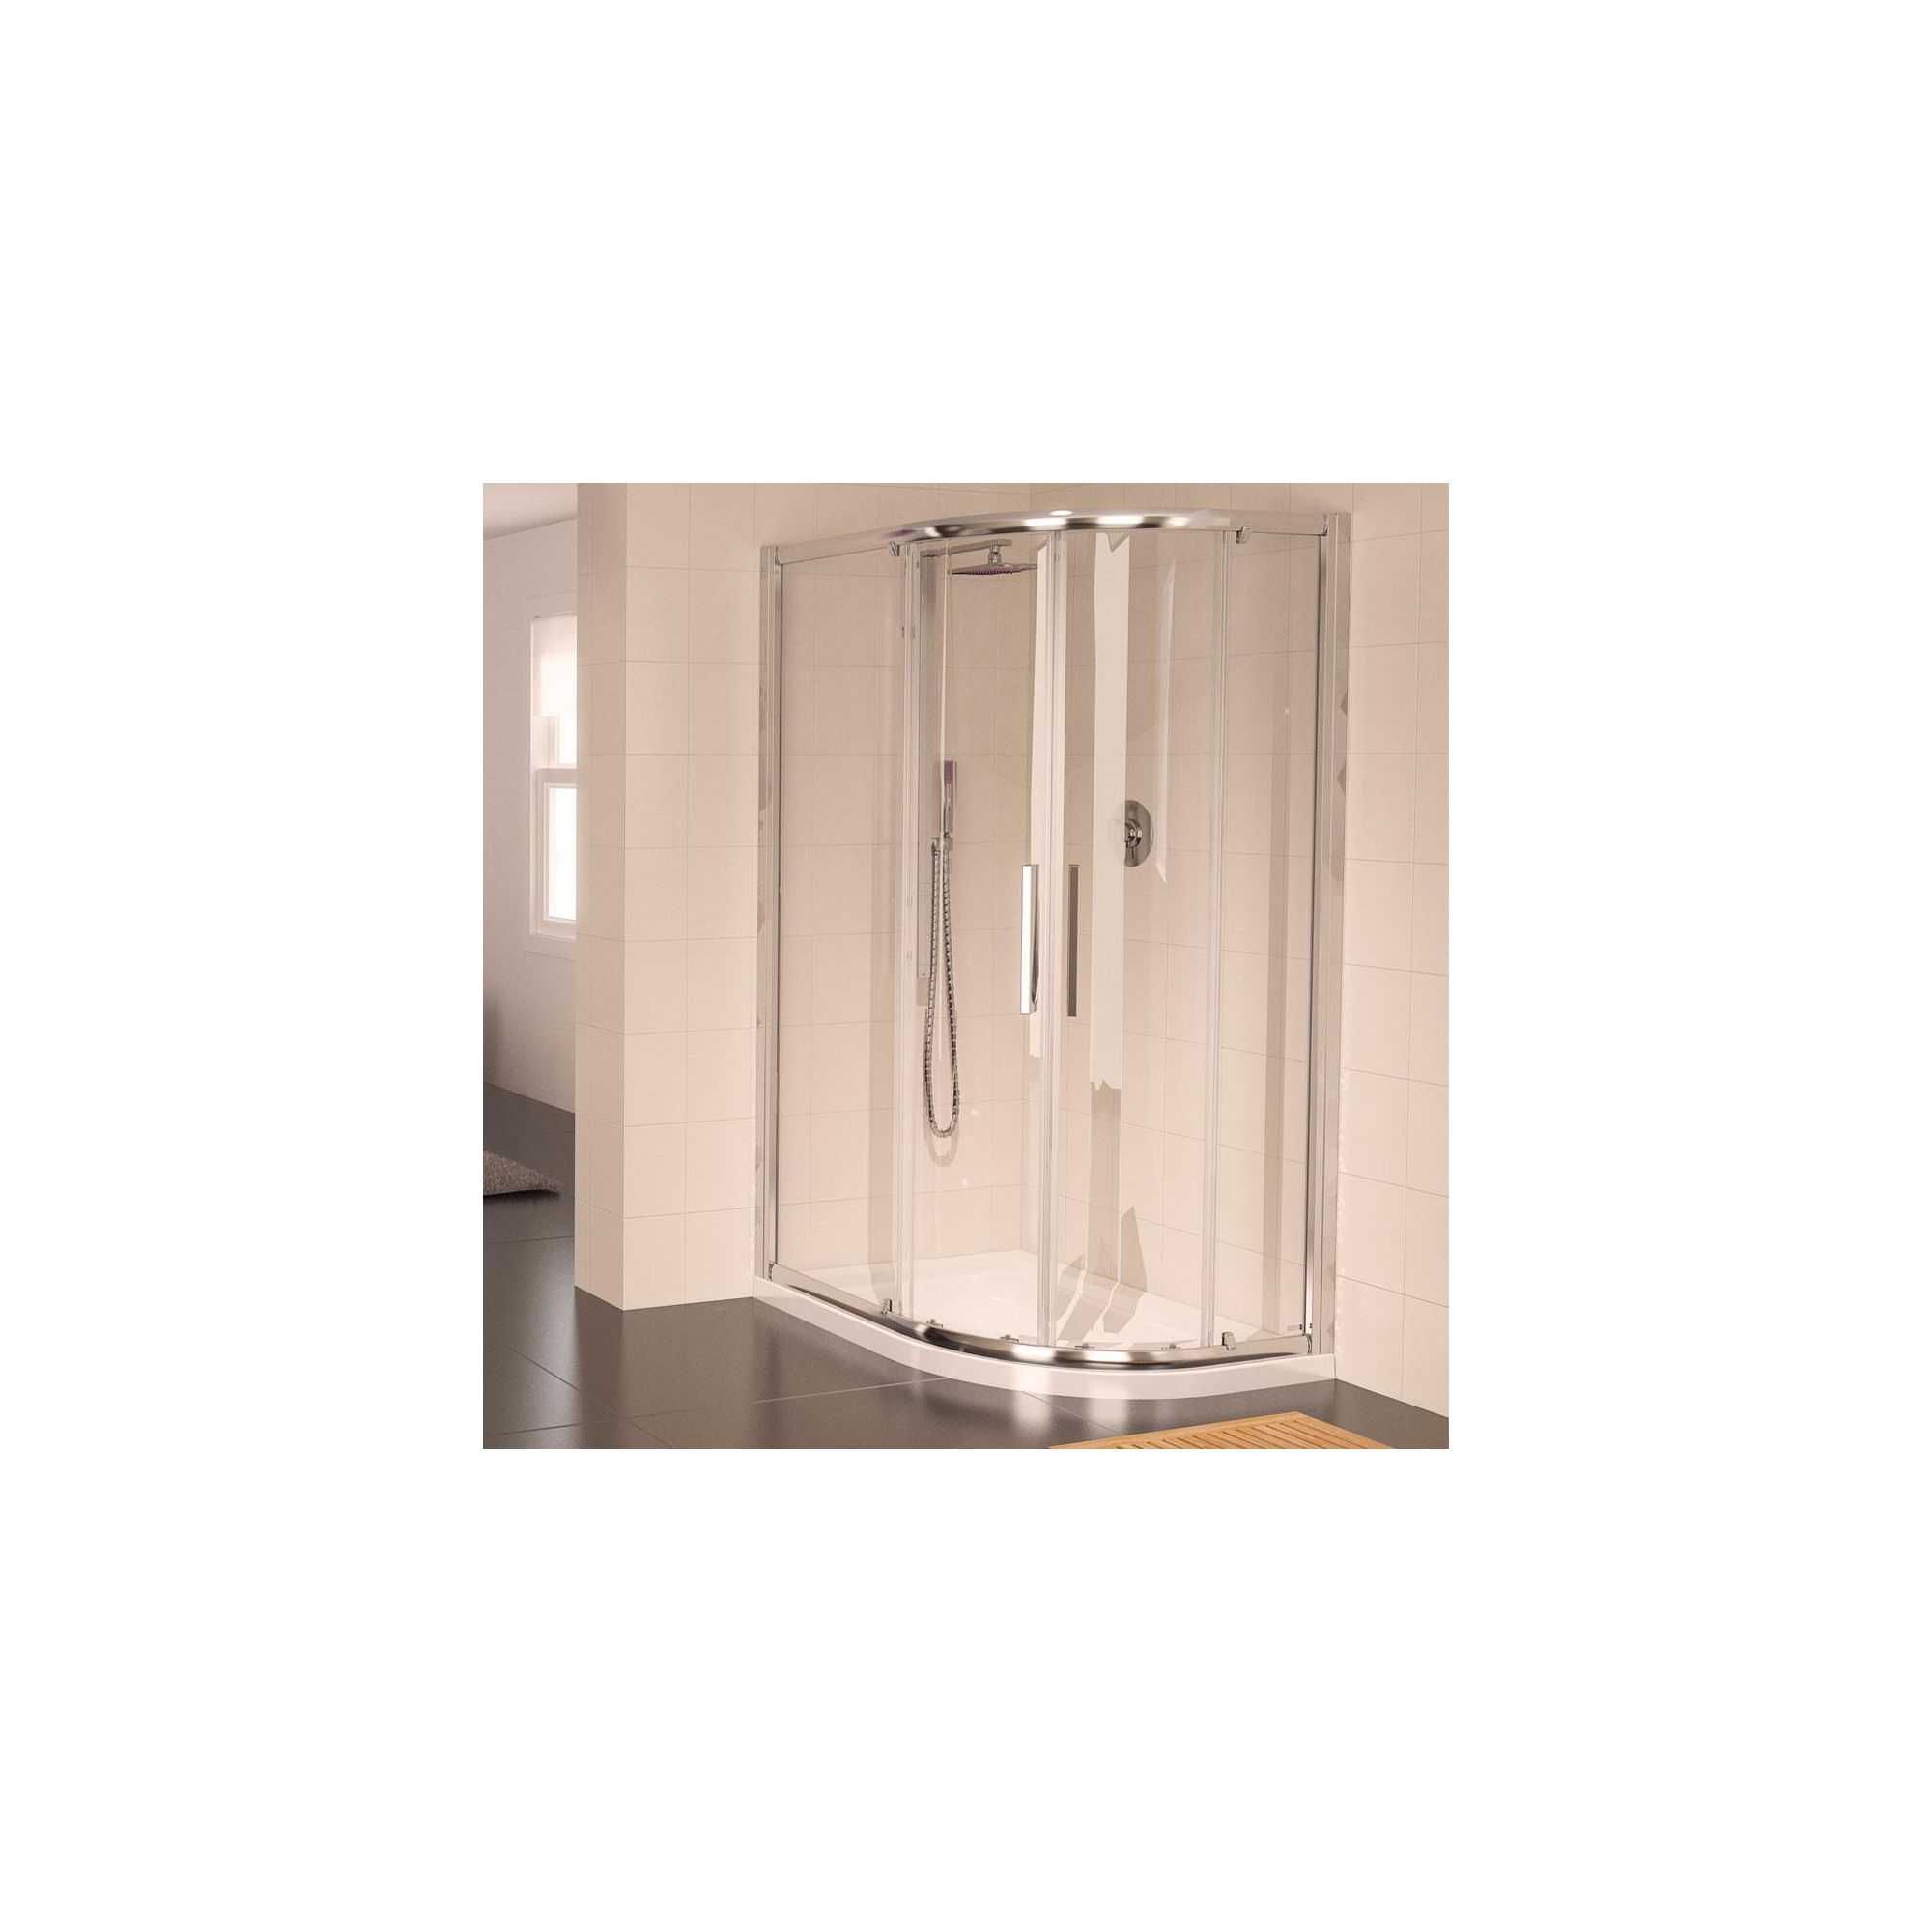 Aqualux AQUA8 Glide Offset Quadrant Shower Door, 1200mm x 800mm, Polished Silver Frame, 8mm Glass at Tesco Direct